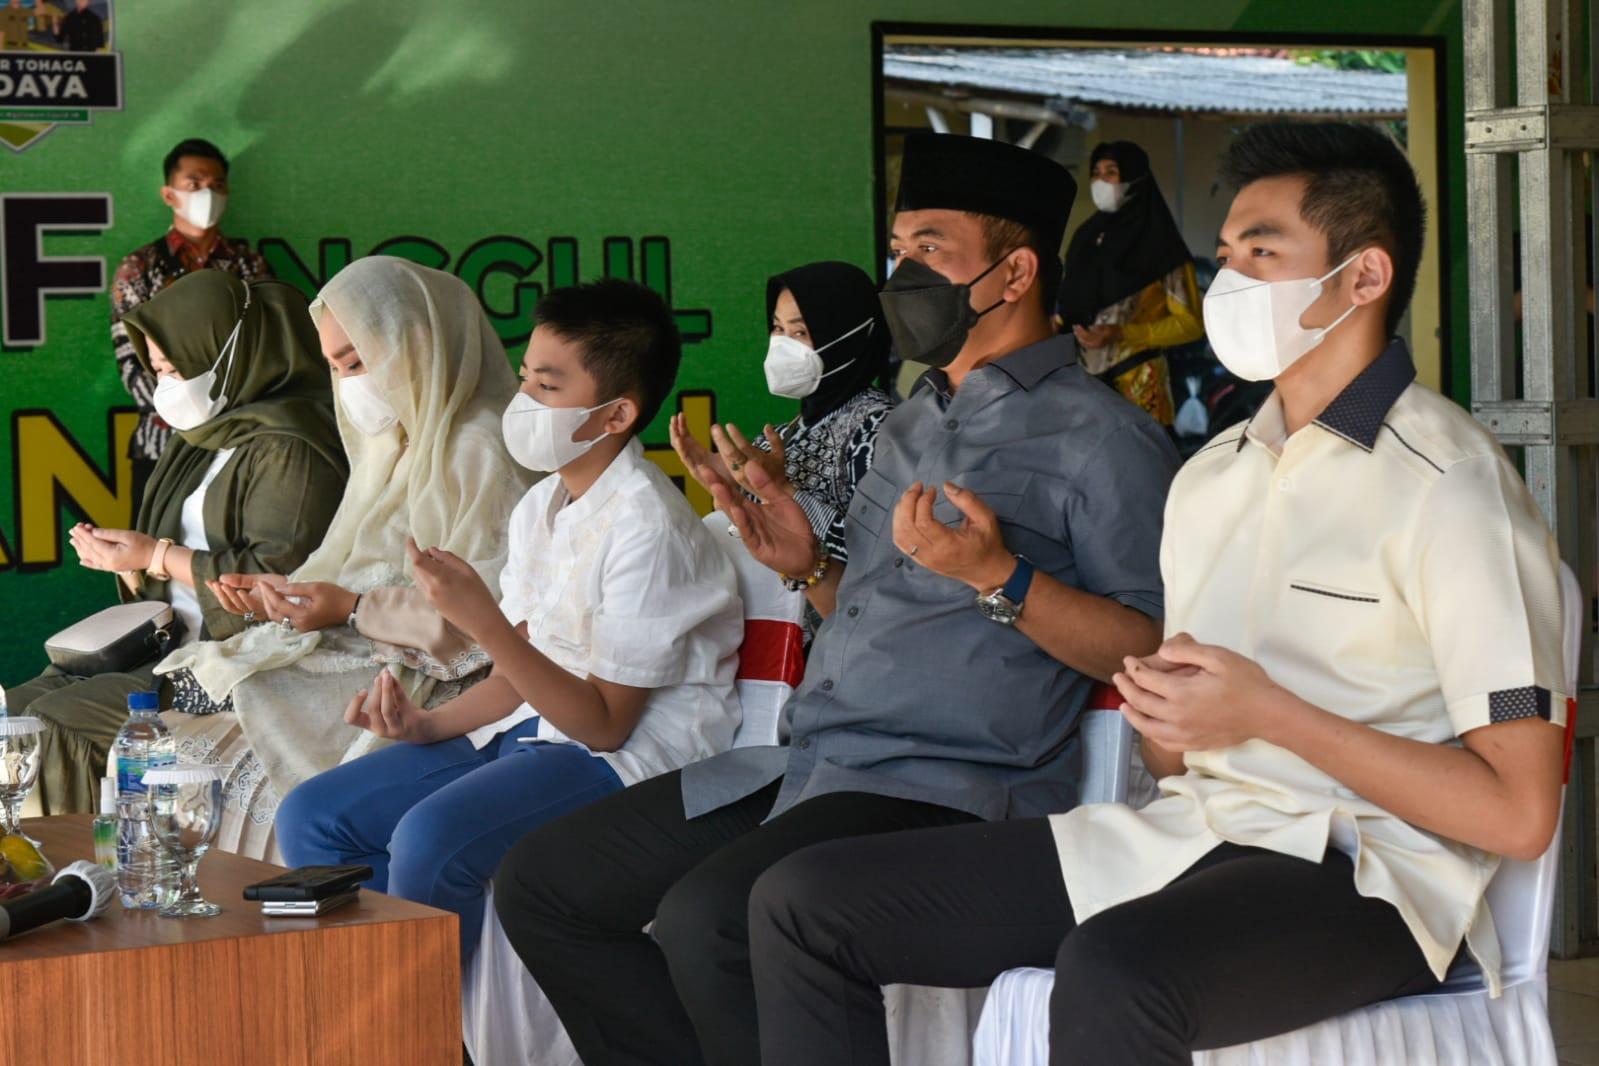 Polresta Cirebon Distribusikan 37 Hewan Kurban ke Sejumlah Pondok Pesantren